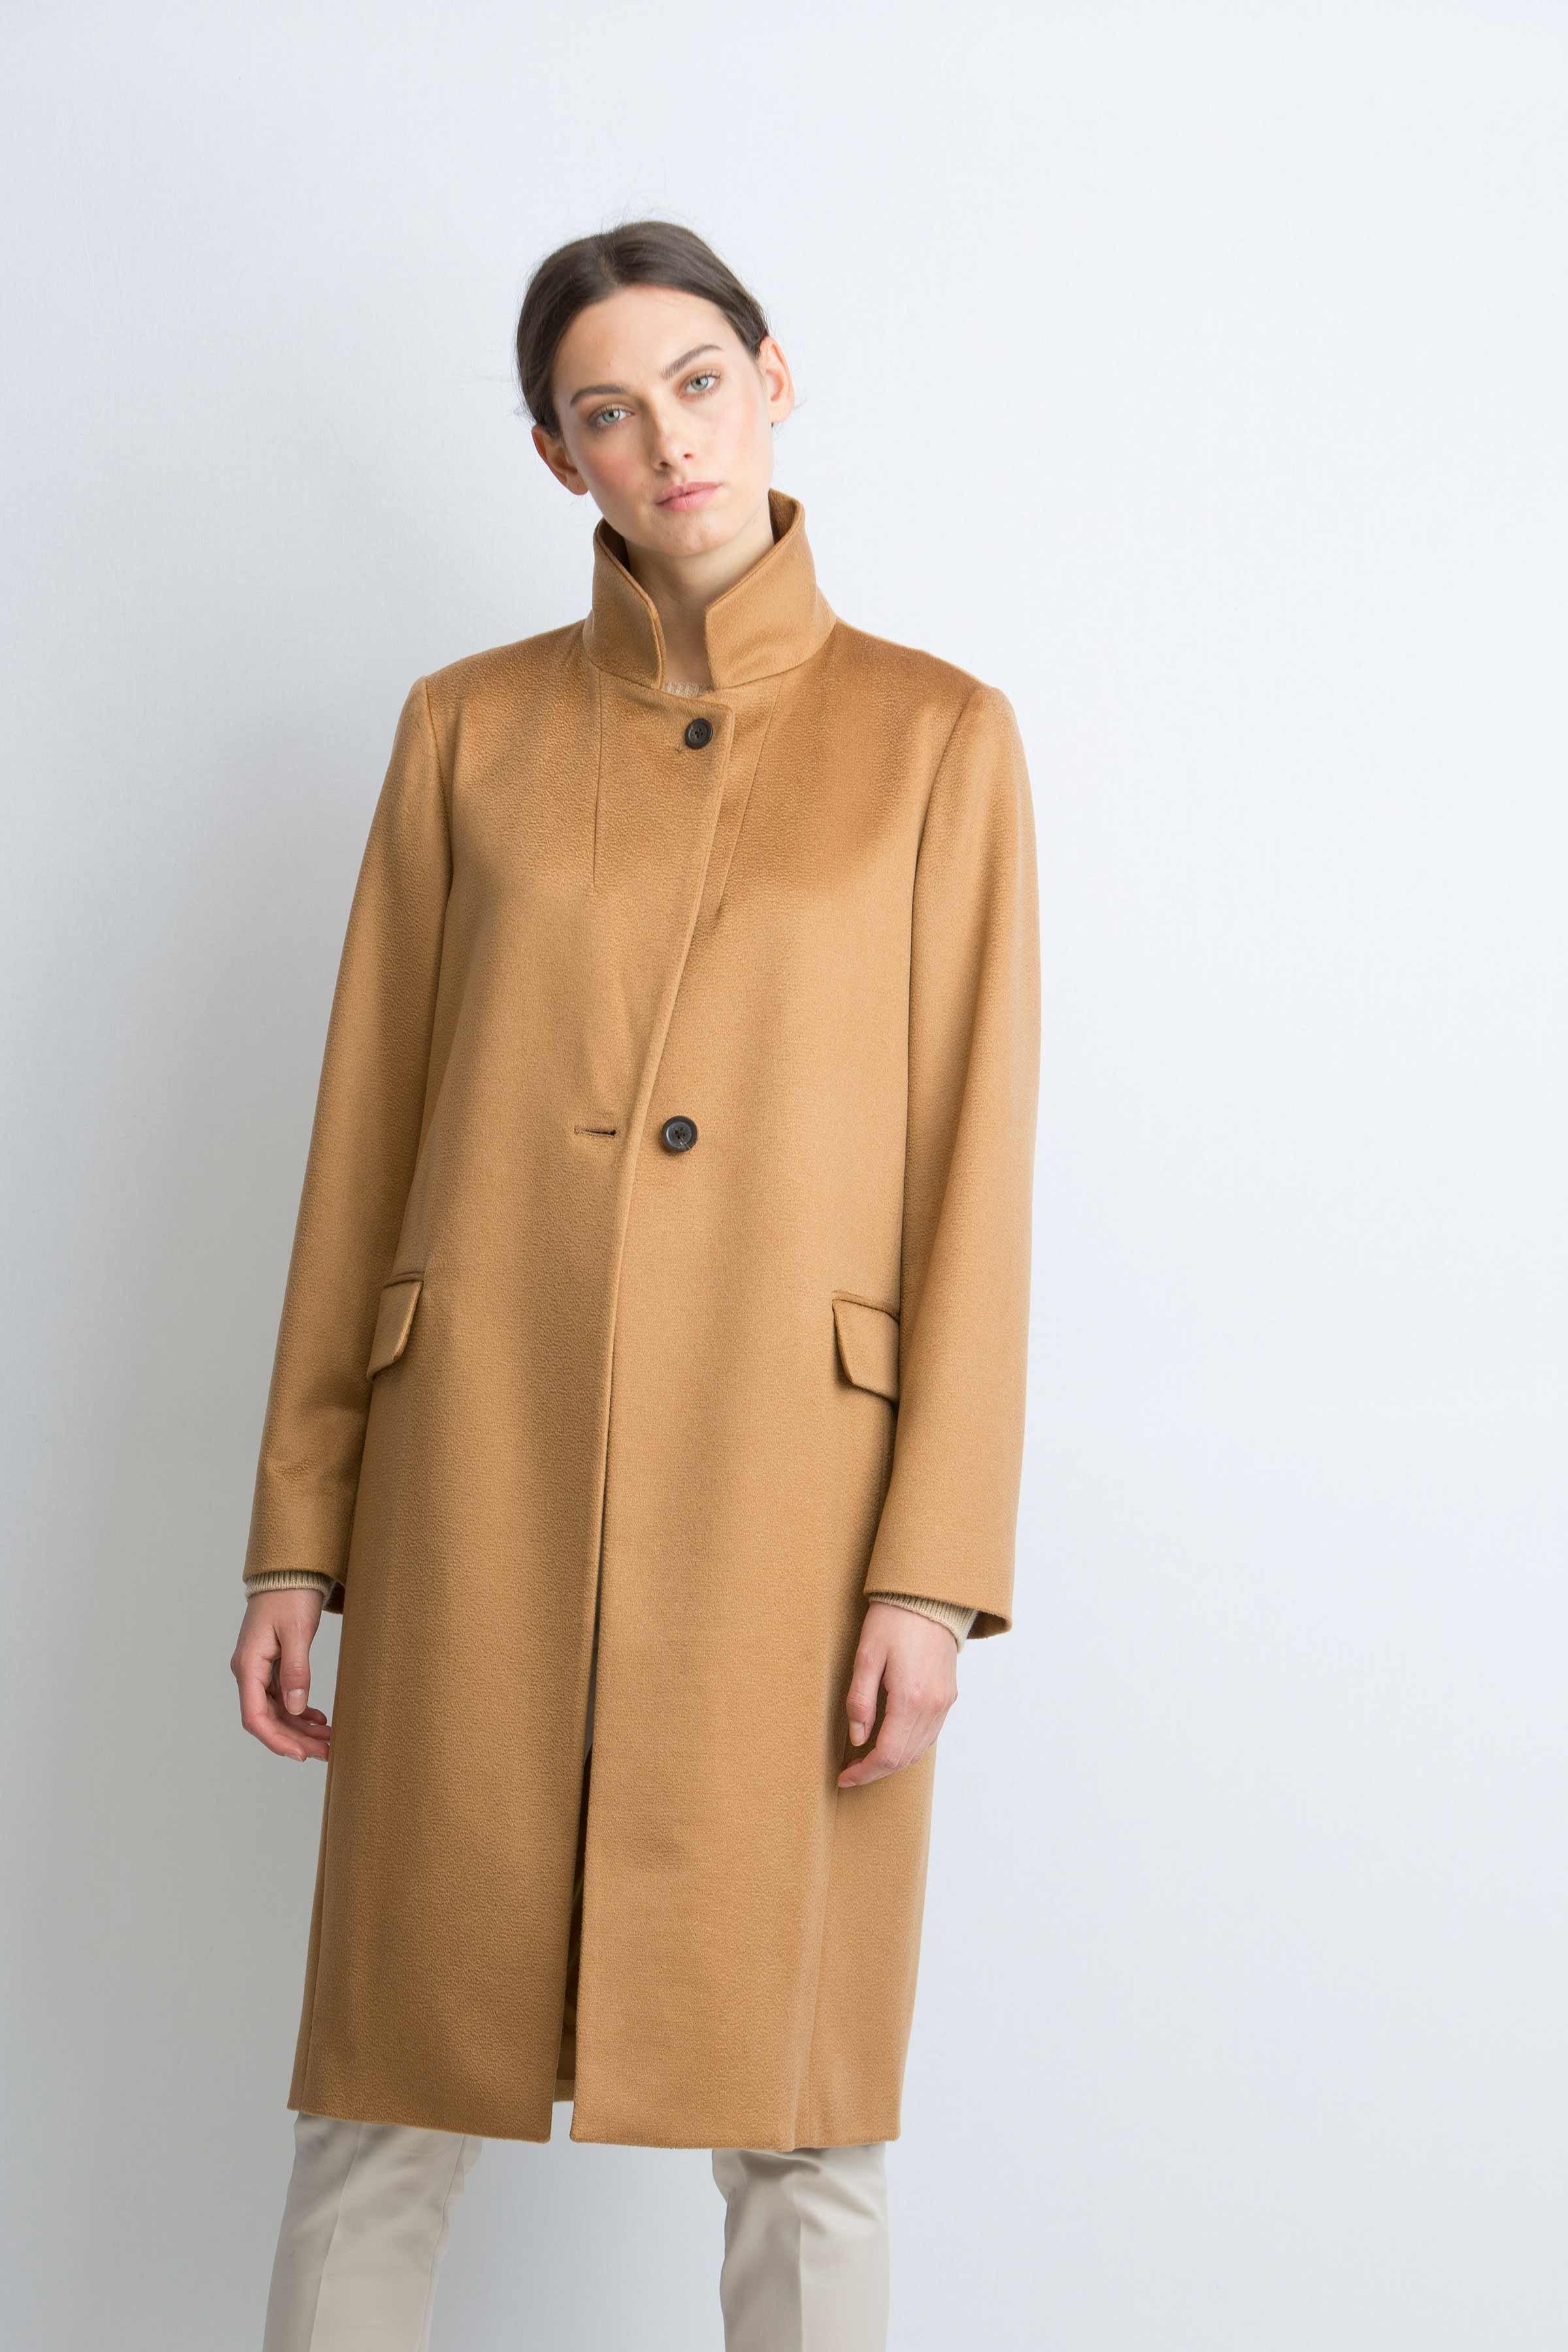 cashmere coat cashmere velour womens dark camel single breast coat | johnstons of elgin jweocbh